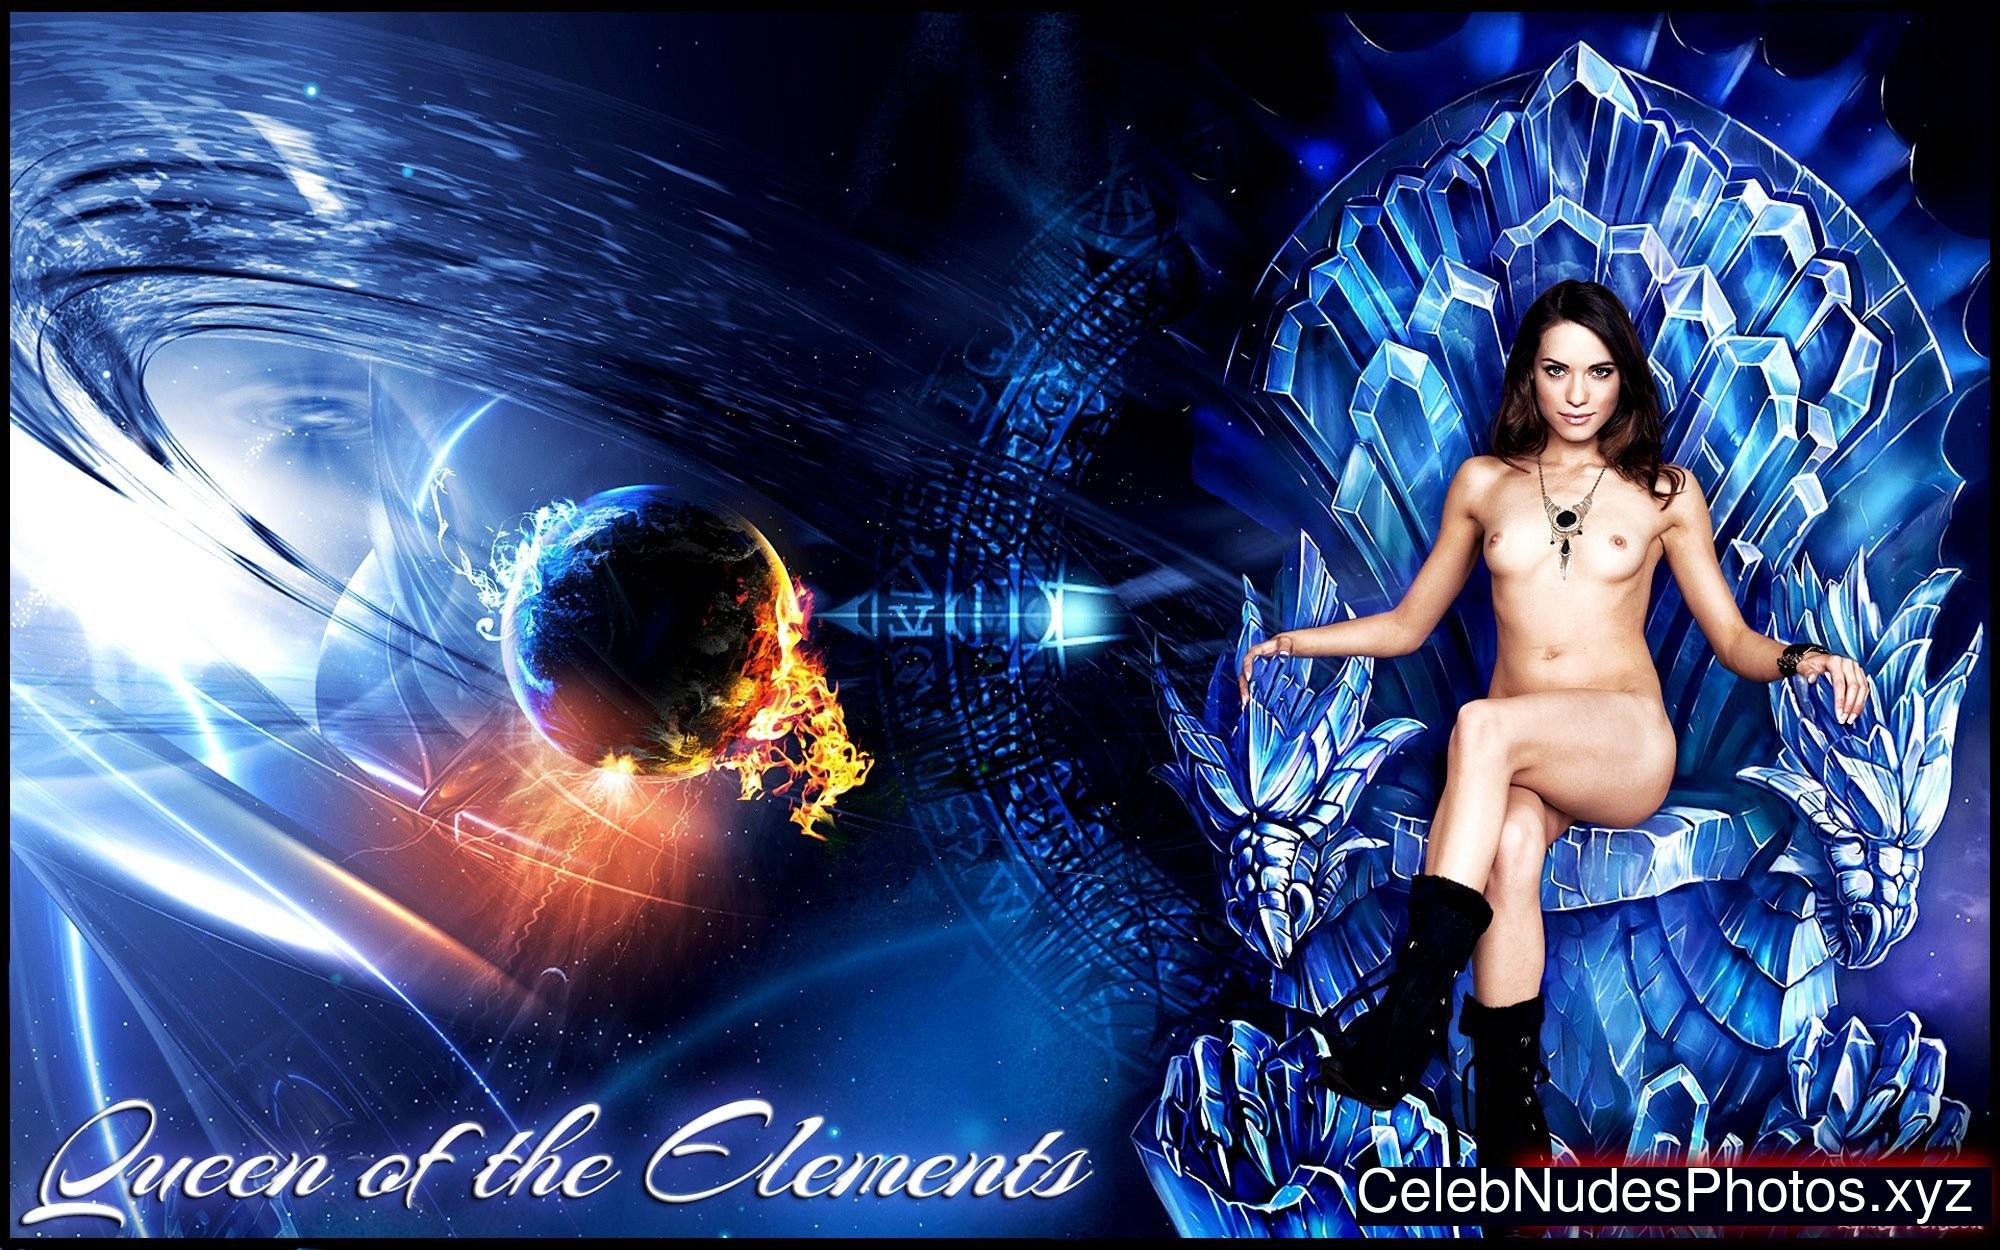 Lyndsy Fonseca free nude celebs